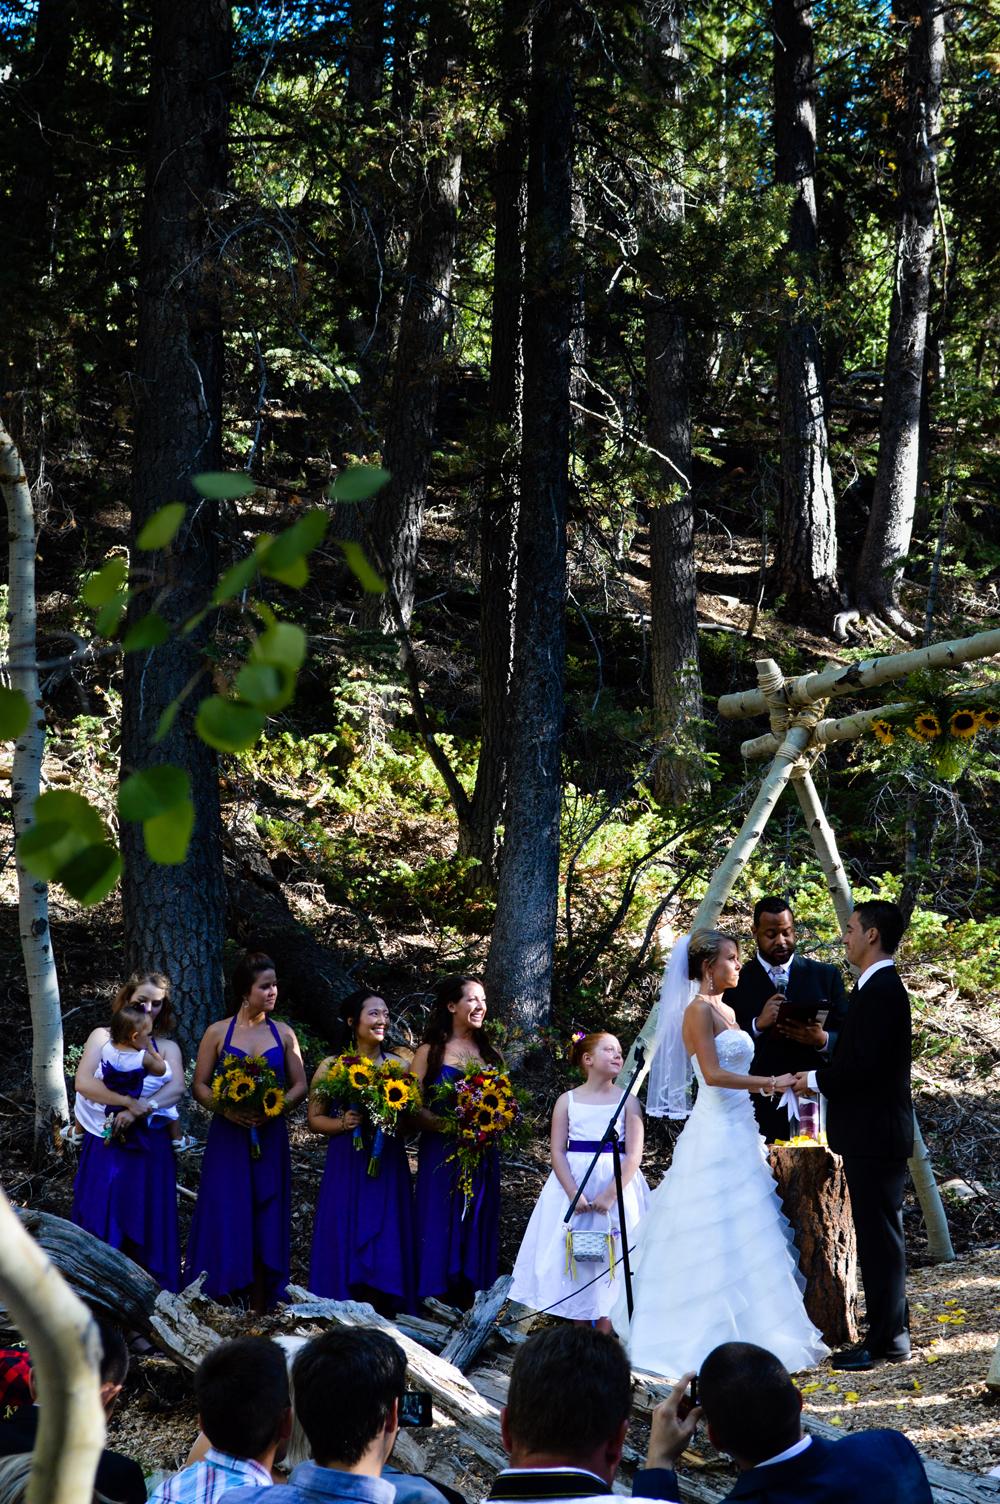 las vegas ski resort archives » little vegas wedding